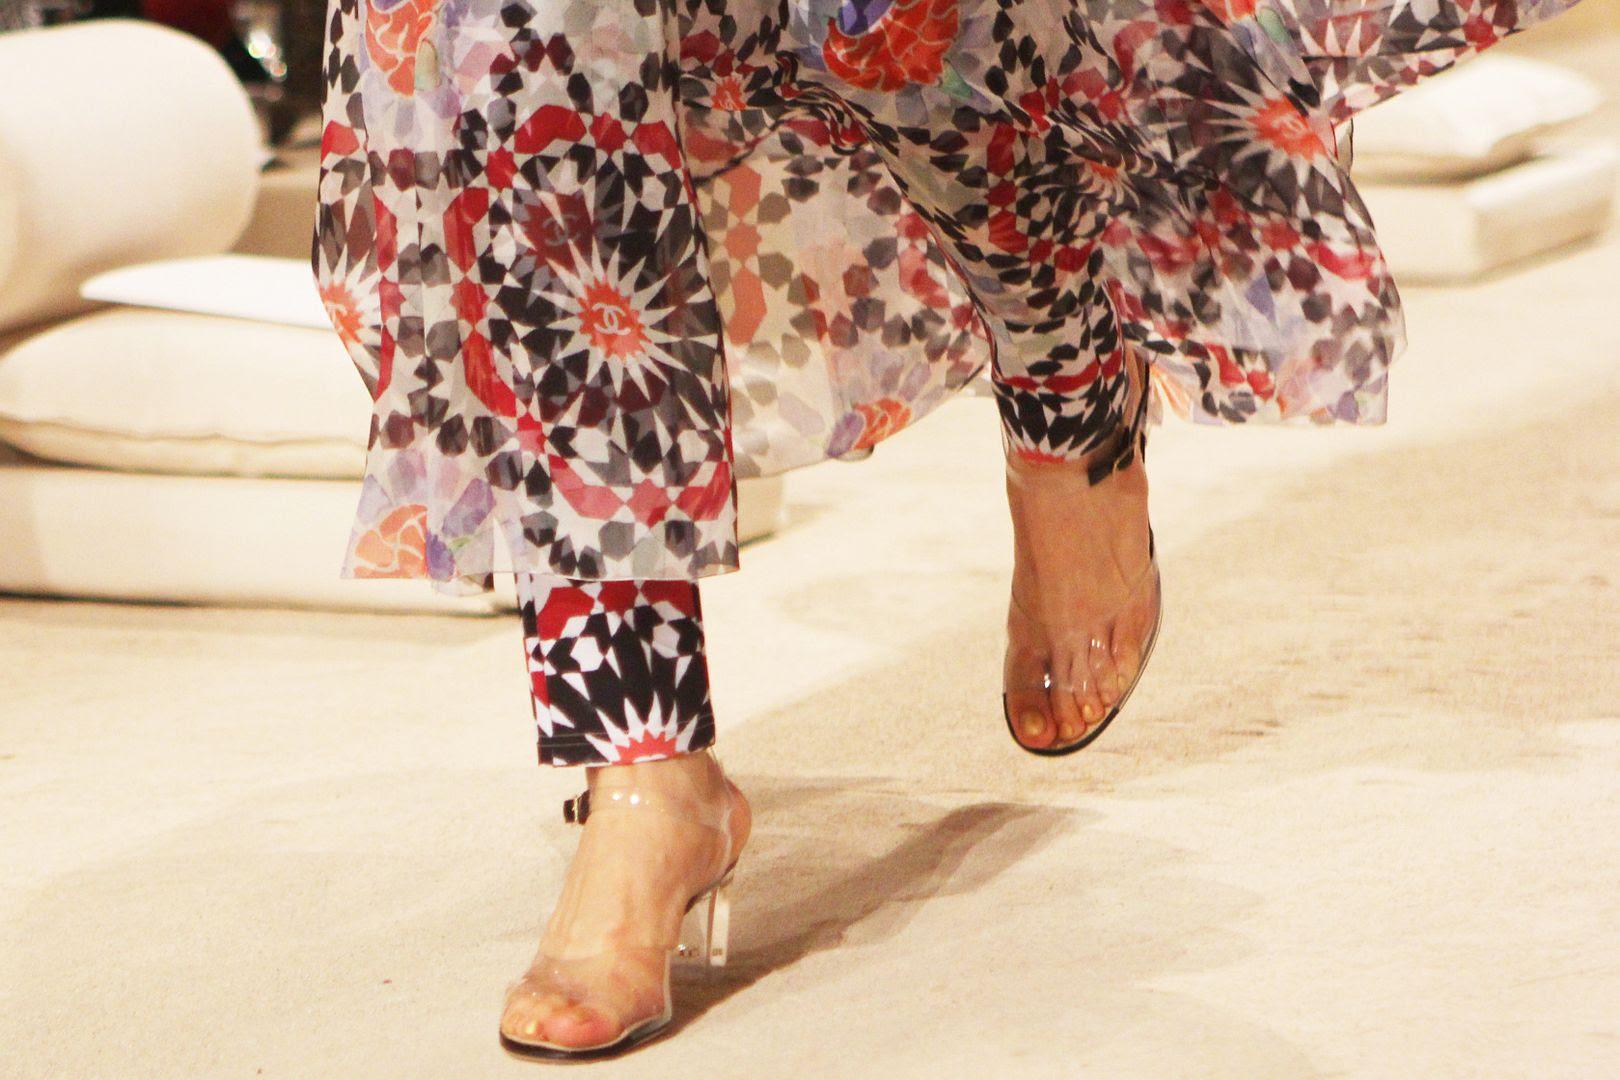 photo runwayshoes-chanelcruisedubai-silkscarfdress-dubai-beckerman-frontrow-beckermanblog-sisters.jpg